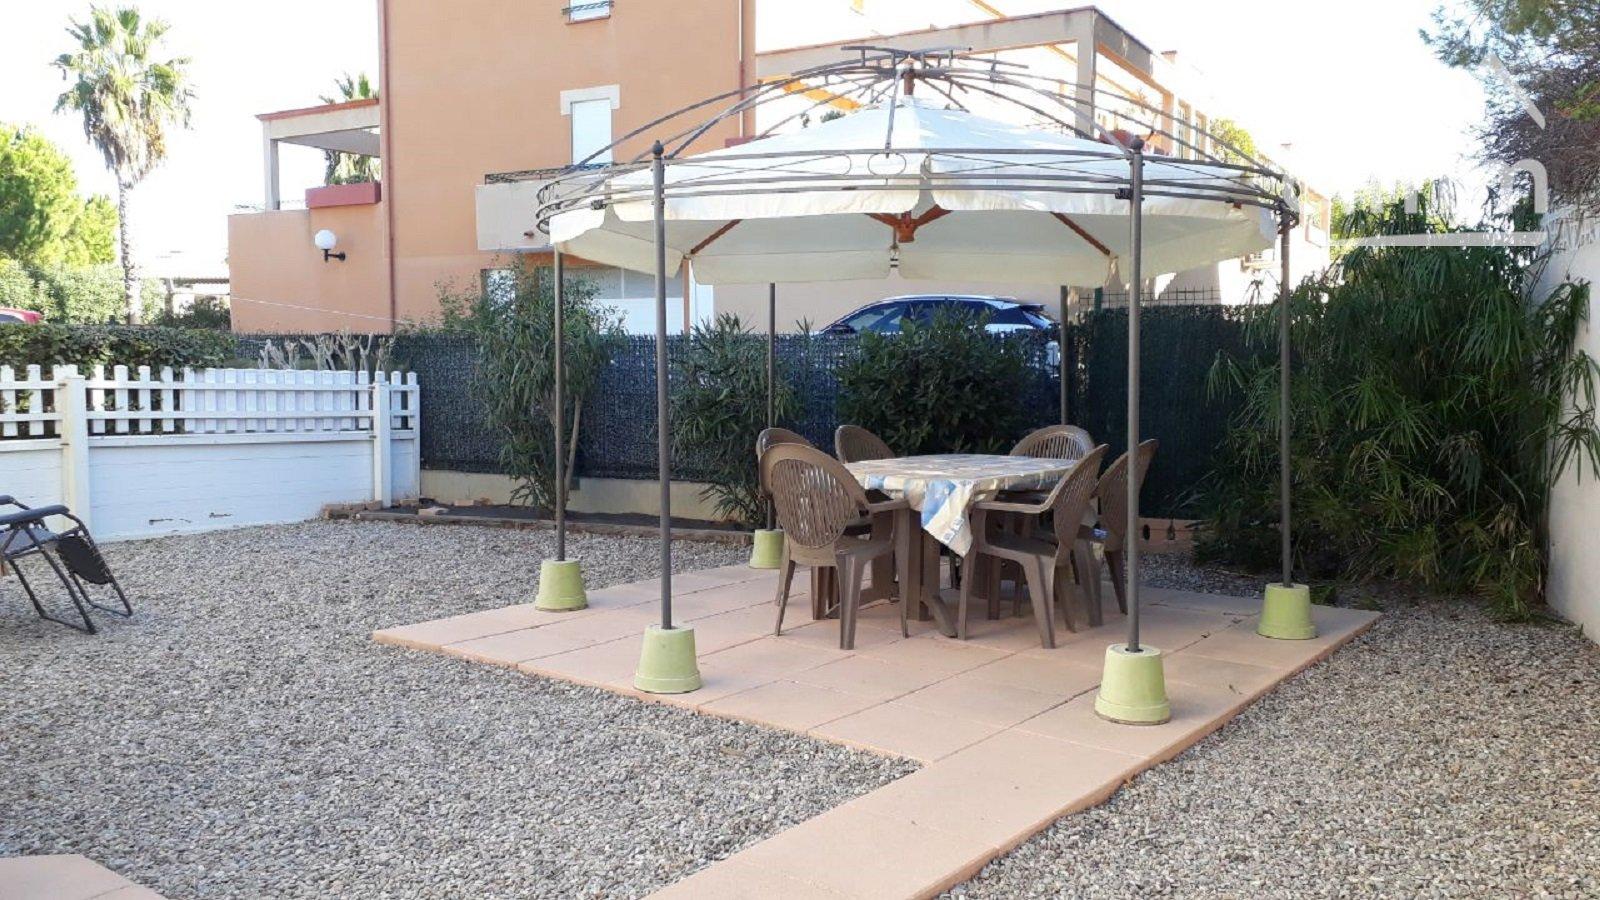 Image - Maison en résidence - VALRAS PLAGE - Location Vacances - 40m² - IMMOPLAGE VALRAS-PLAGE